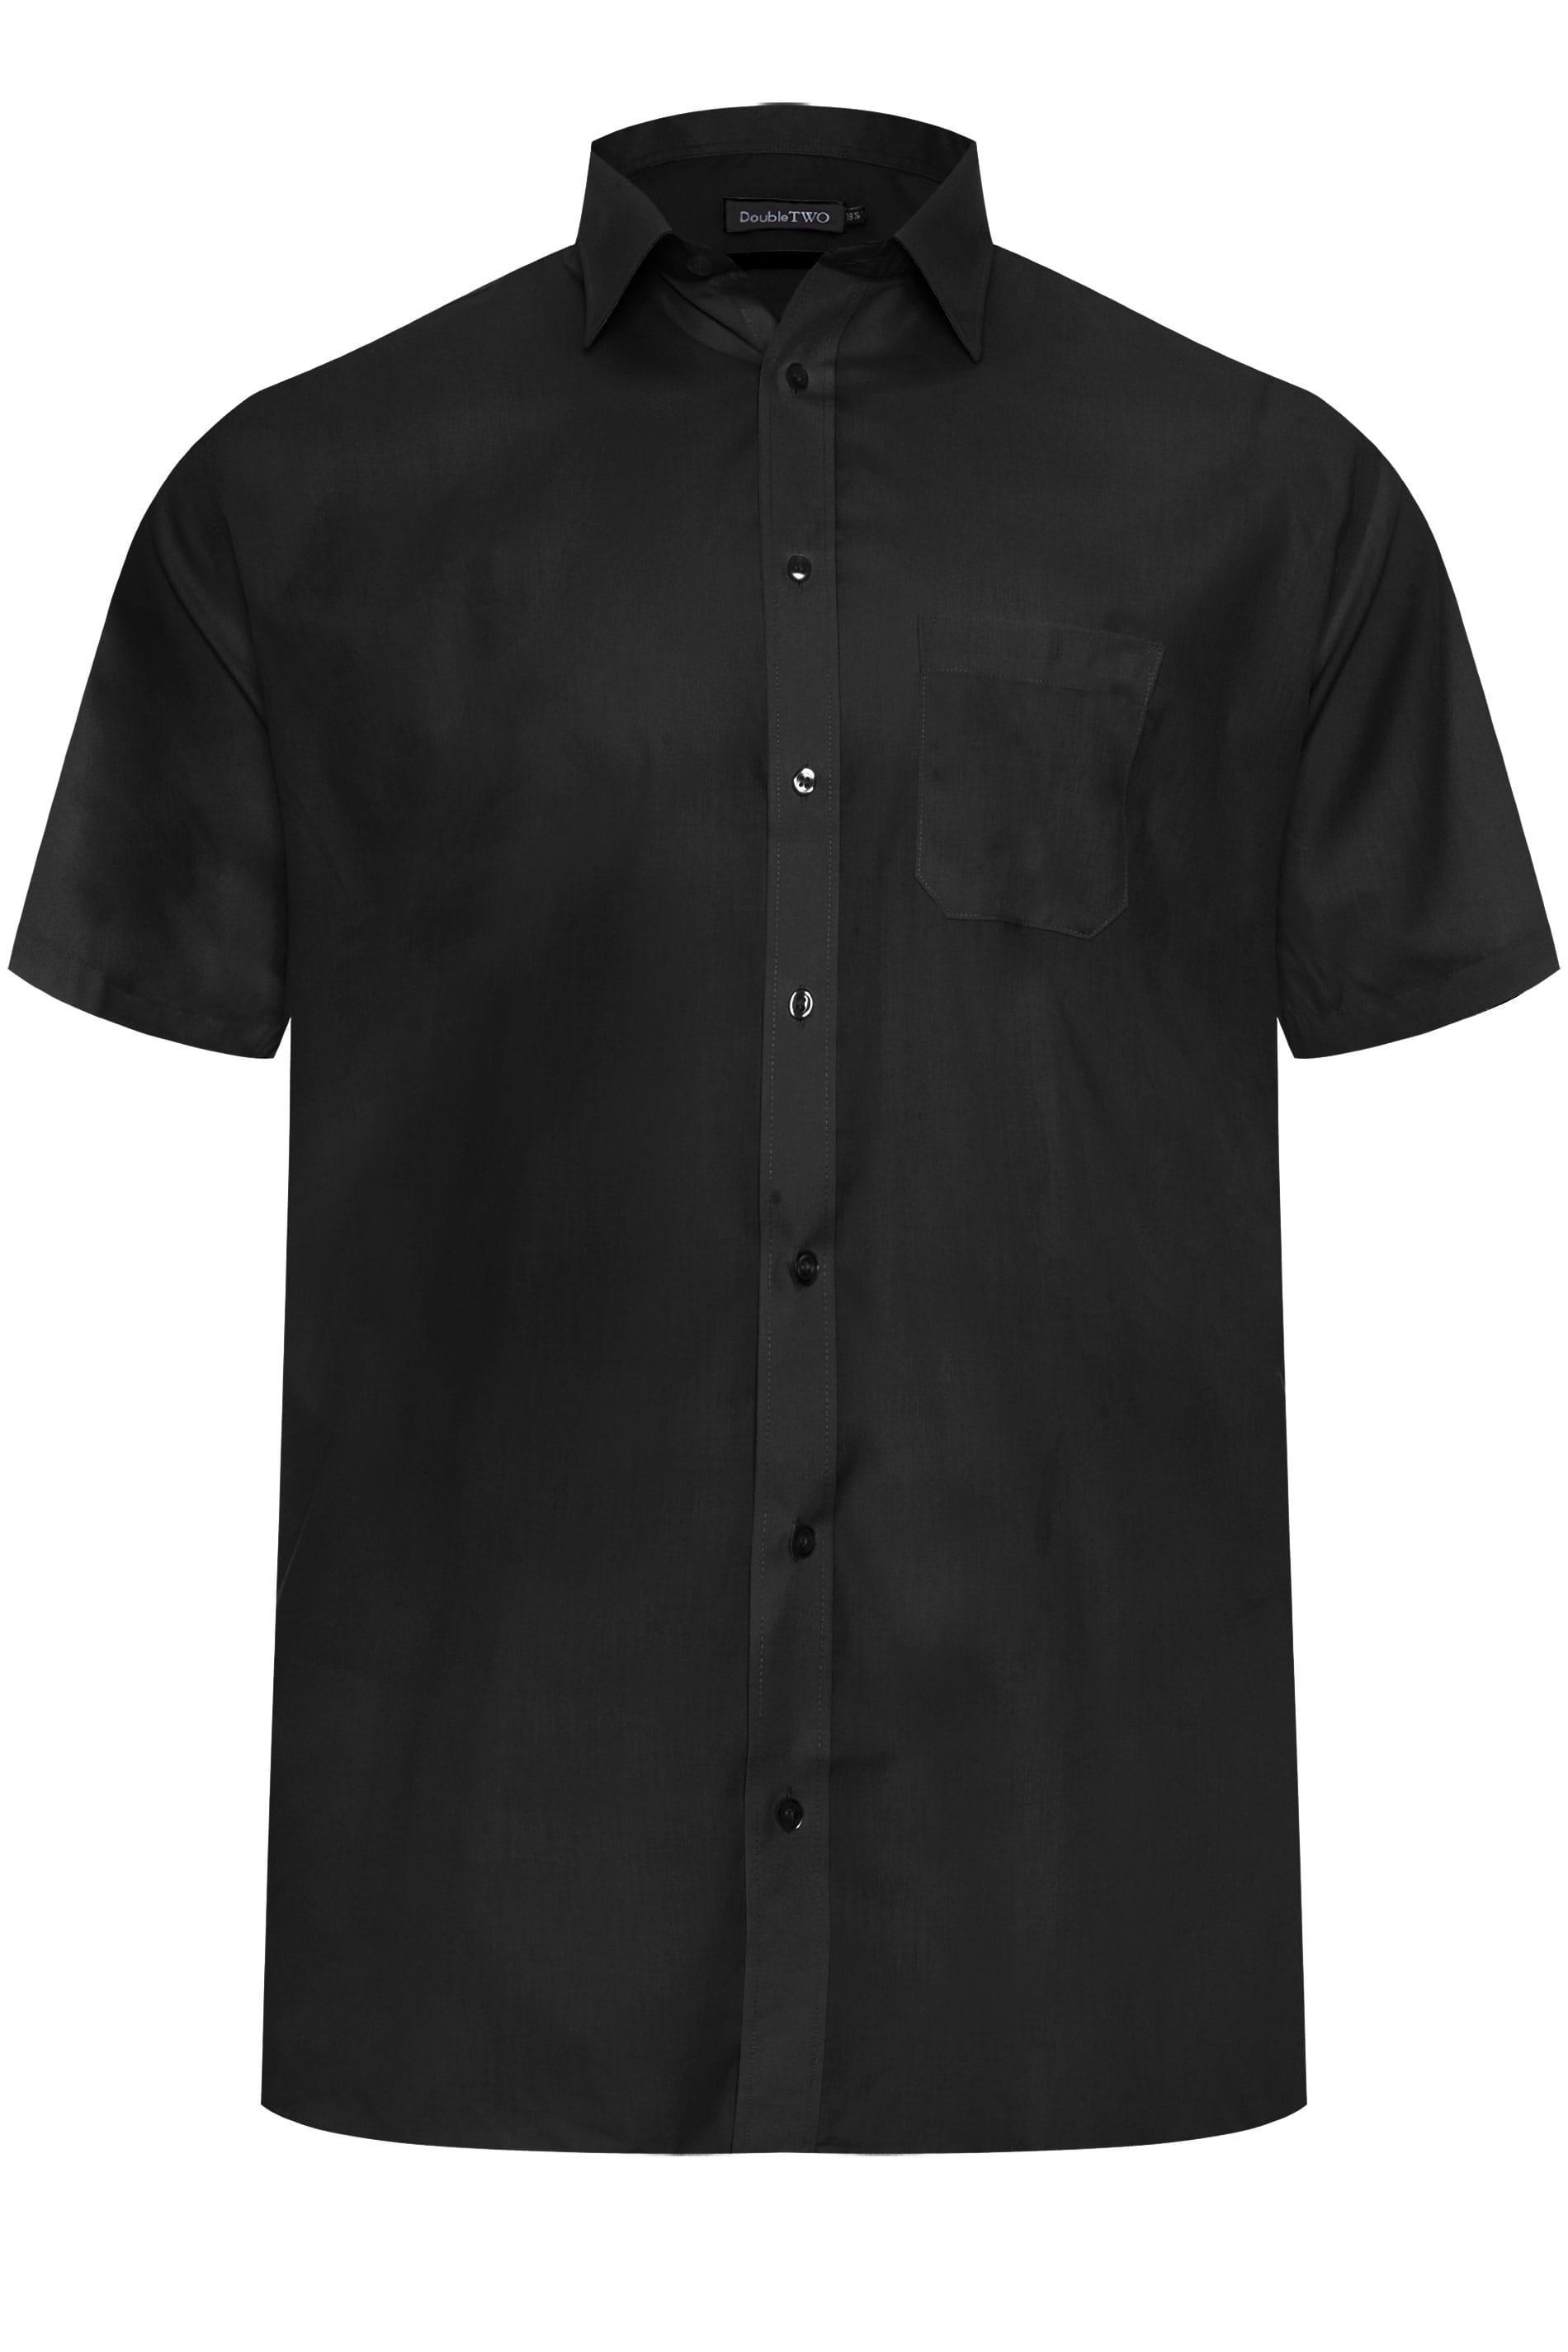 DOUBLE TWO Black Non-Iron Short Sleeve Shirt